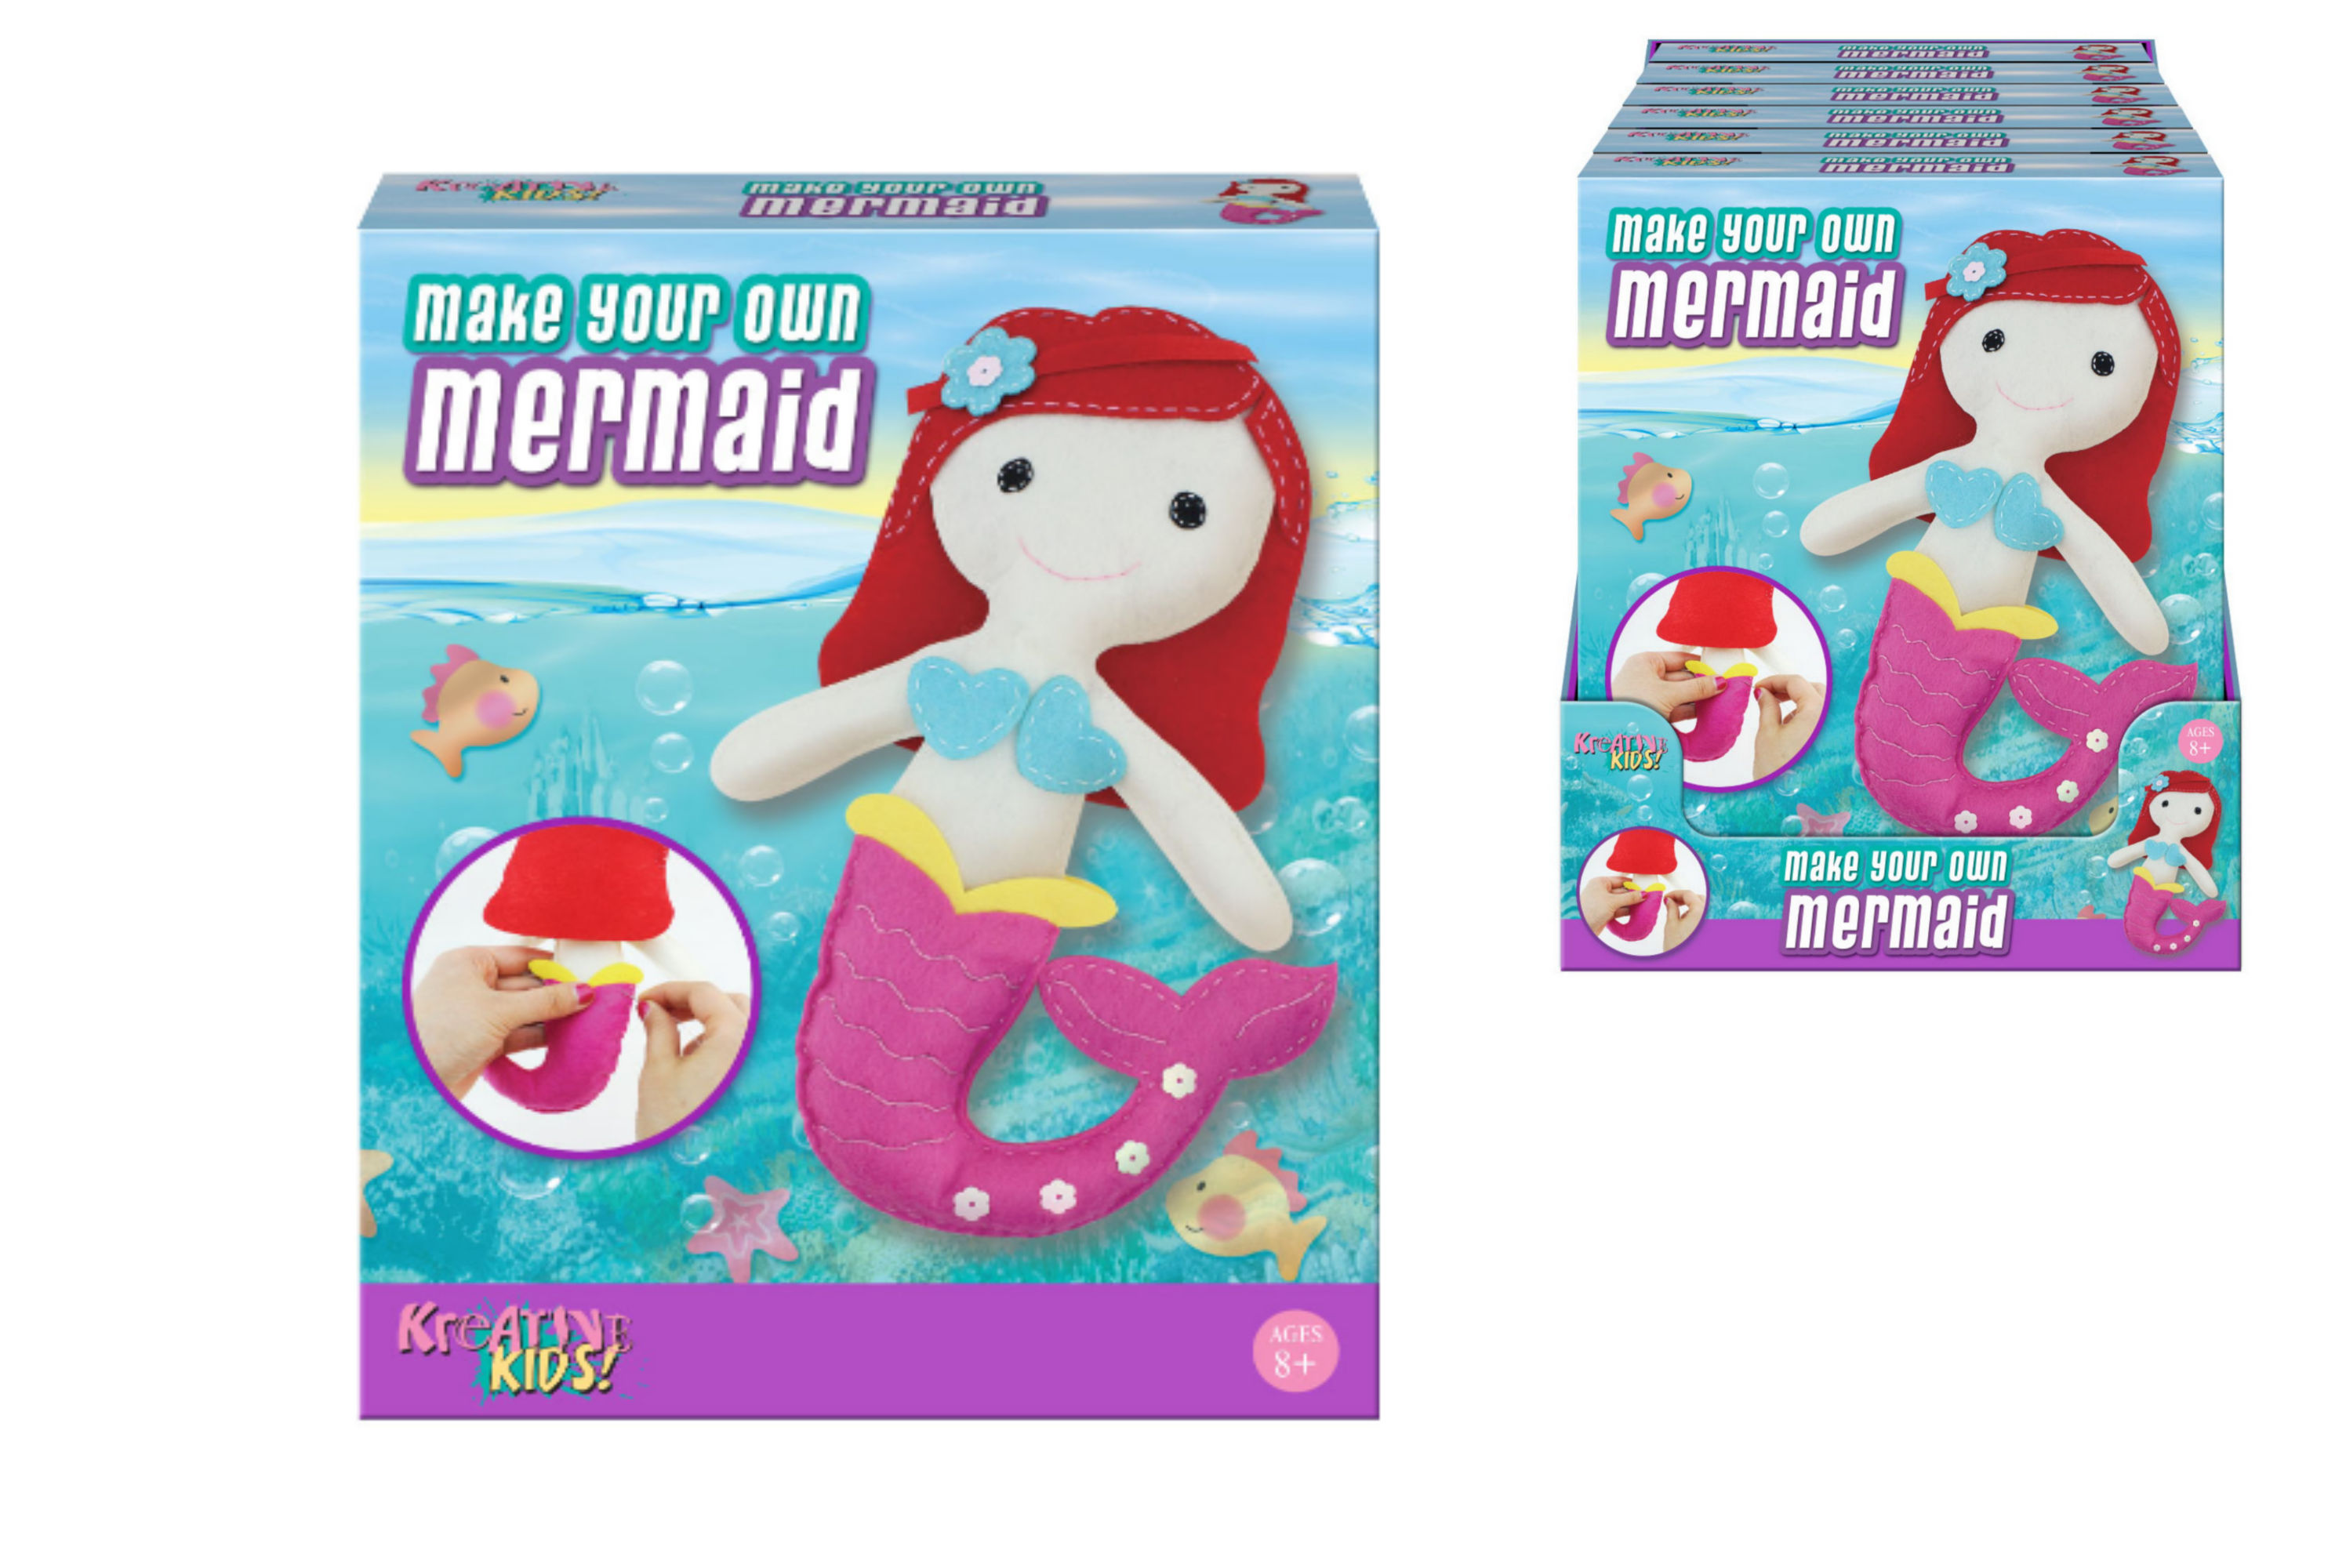 Make Your Own Felt & Stuff Mermaid In Colour Box Pdq